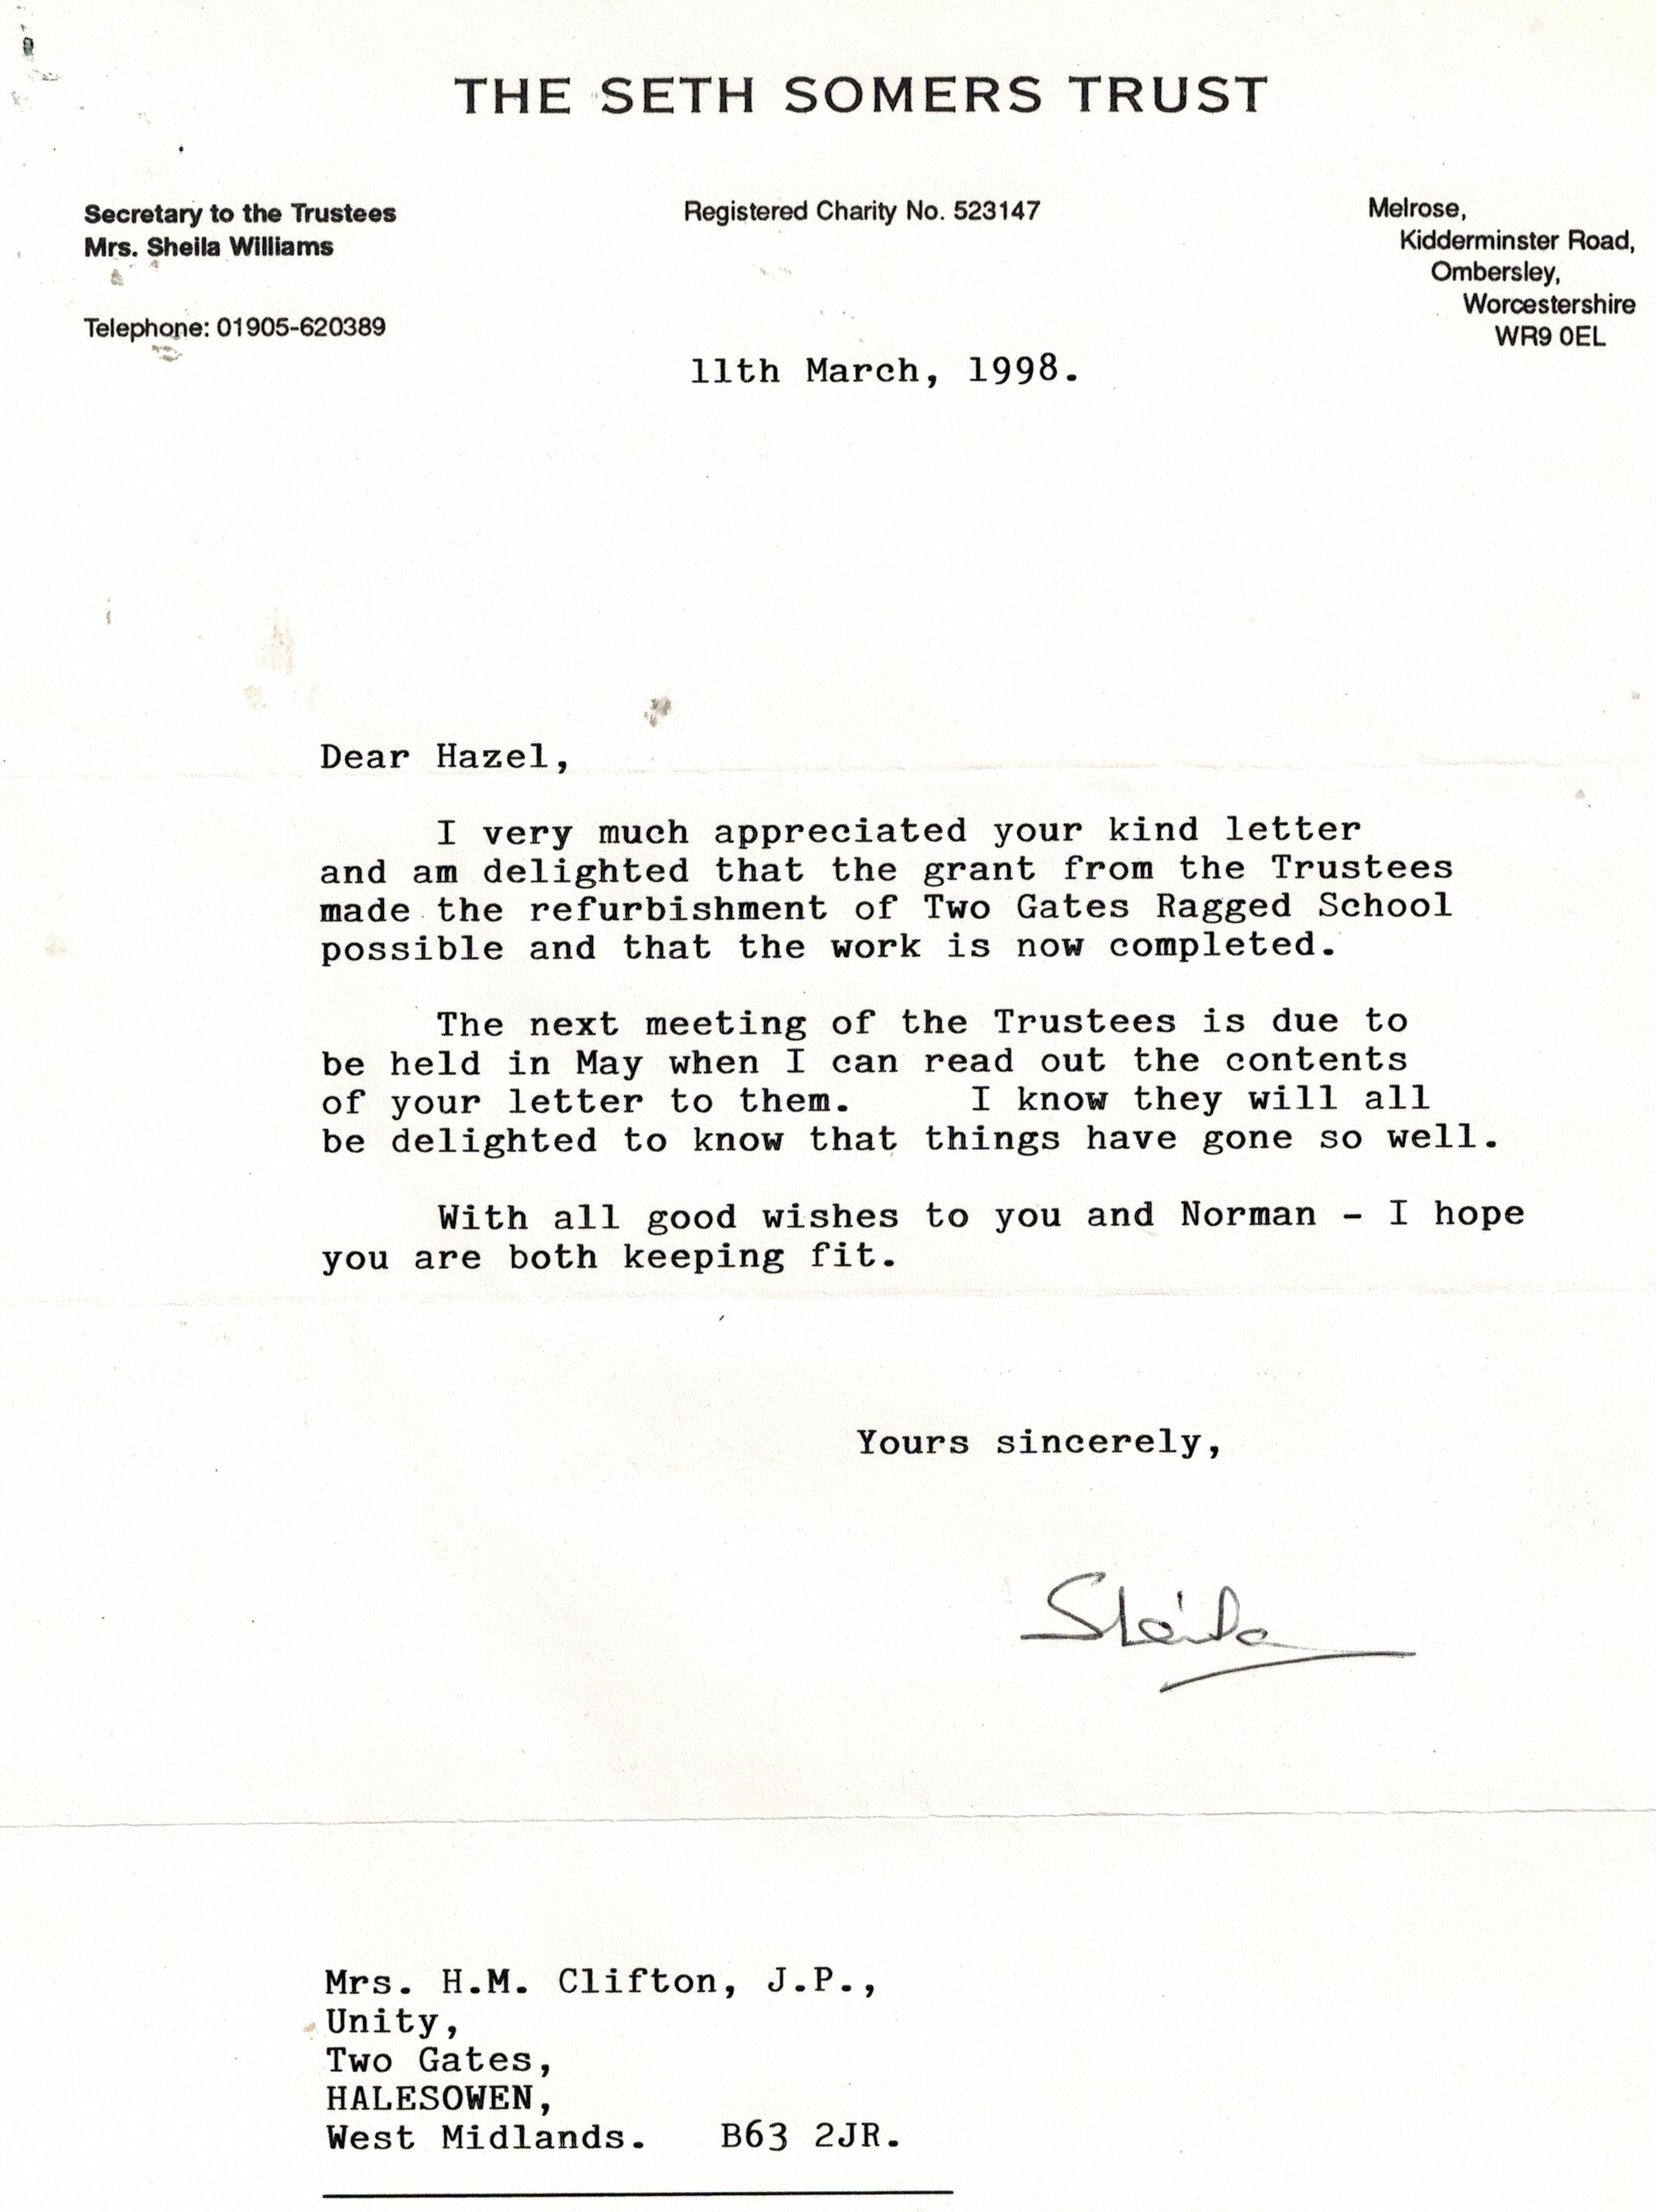 N014_Letter_Seth-Somers-Trust)[11-03-1998]